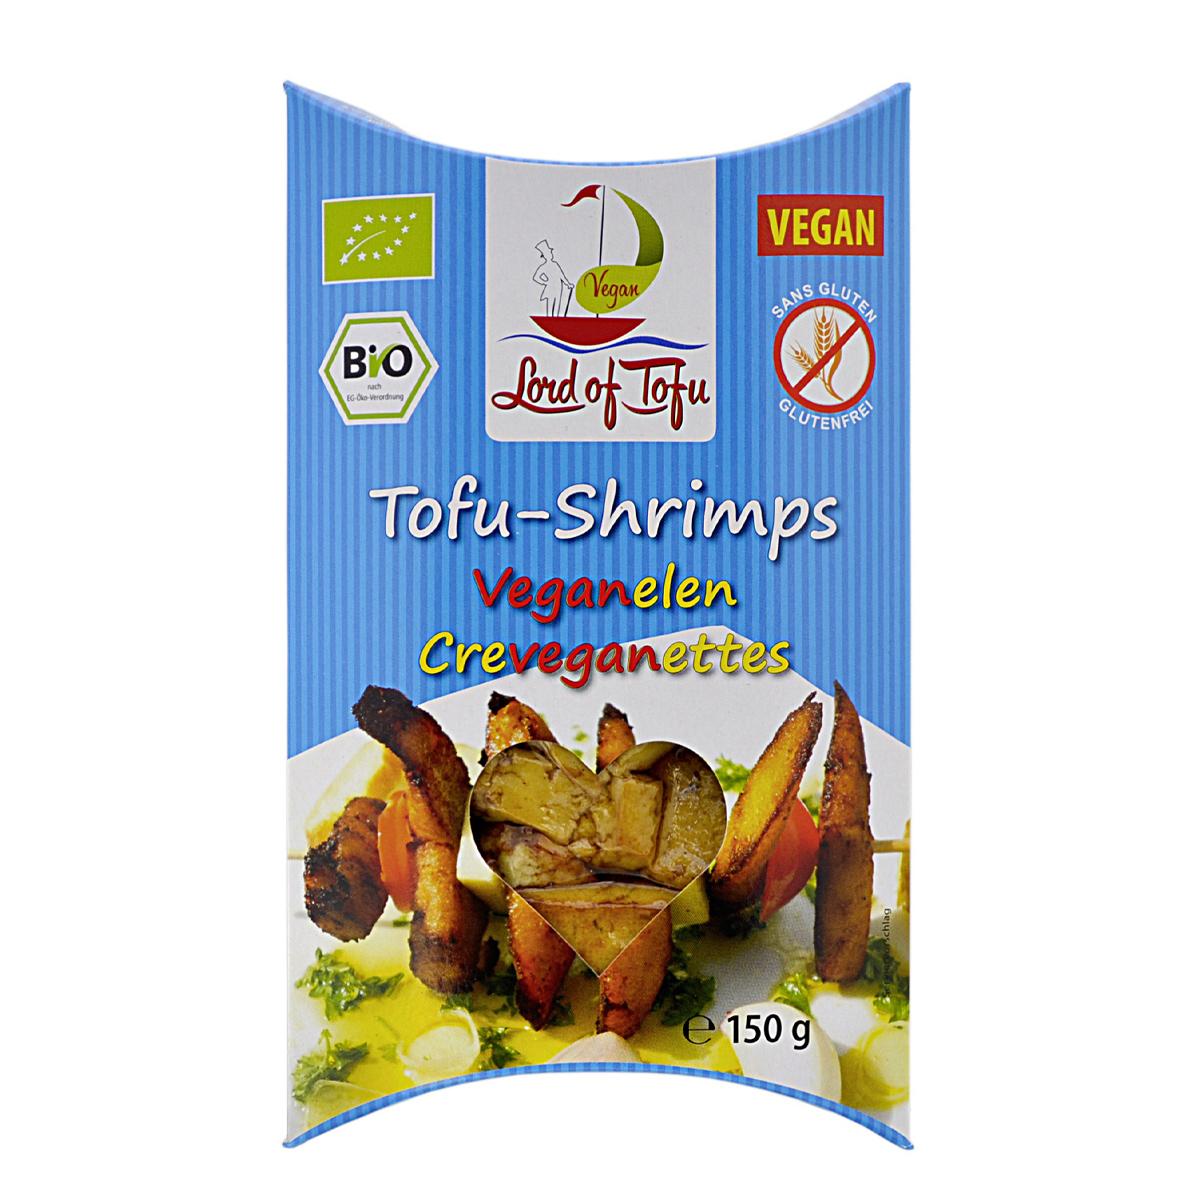 Lord of Tofu - Crevettes de tofu 150g